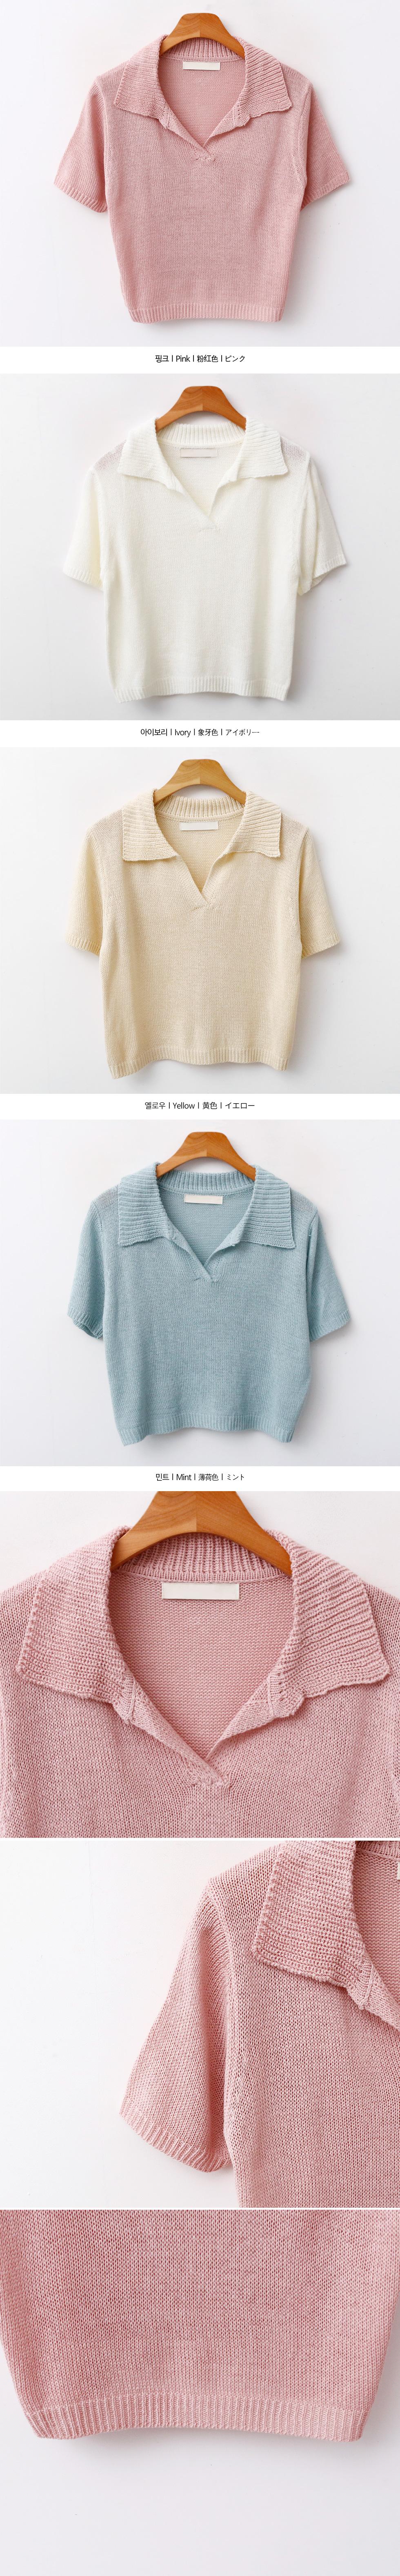 Half Open Collar Knitwear